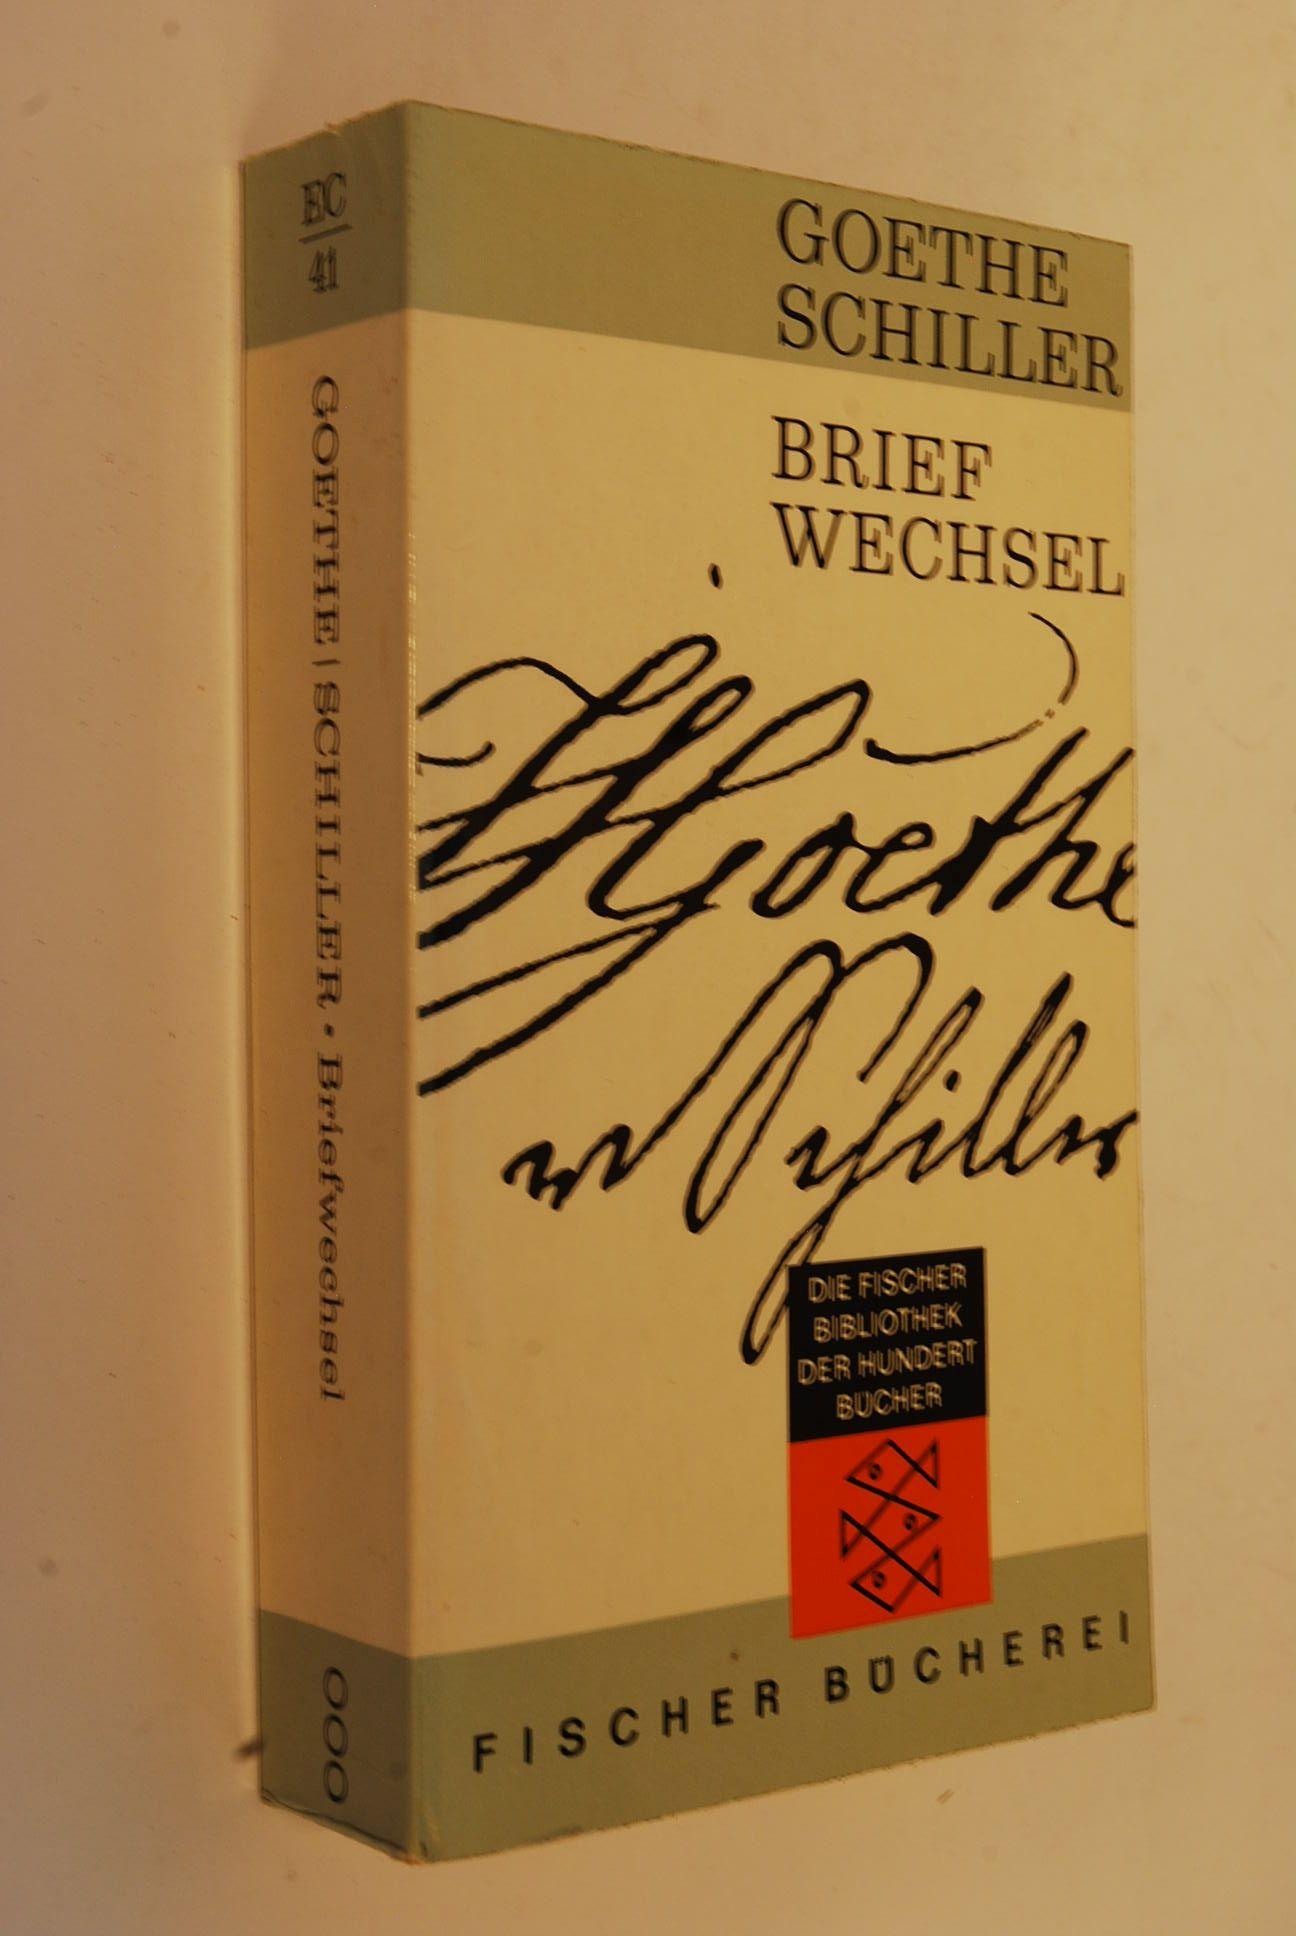 Briefwechsel: Goethe, Johann Wolfgang